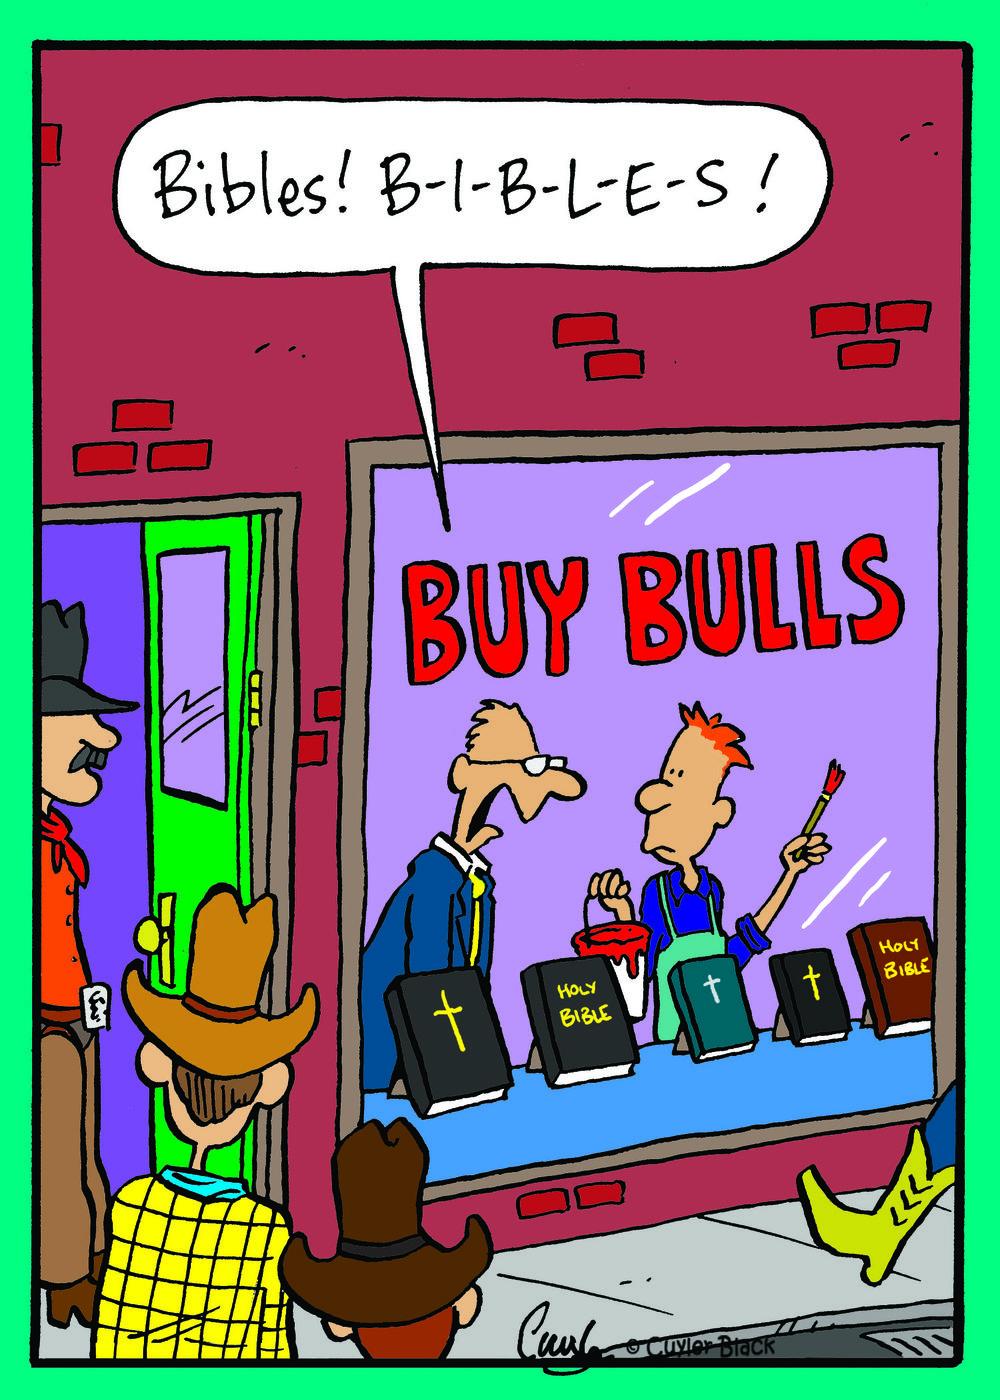 buy bulls.jpg